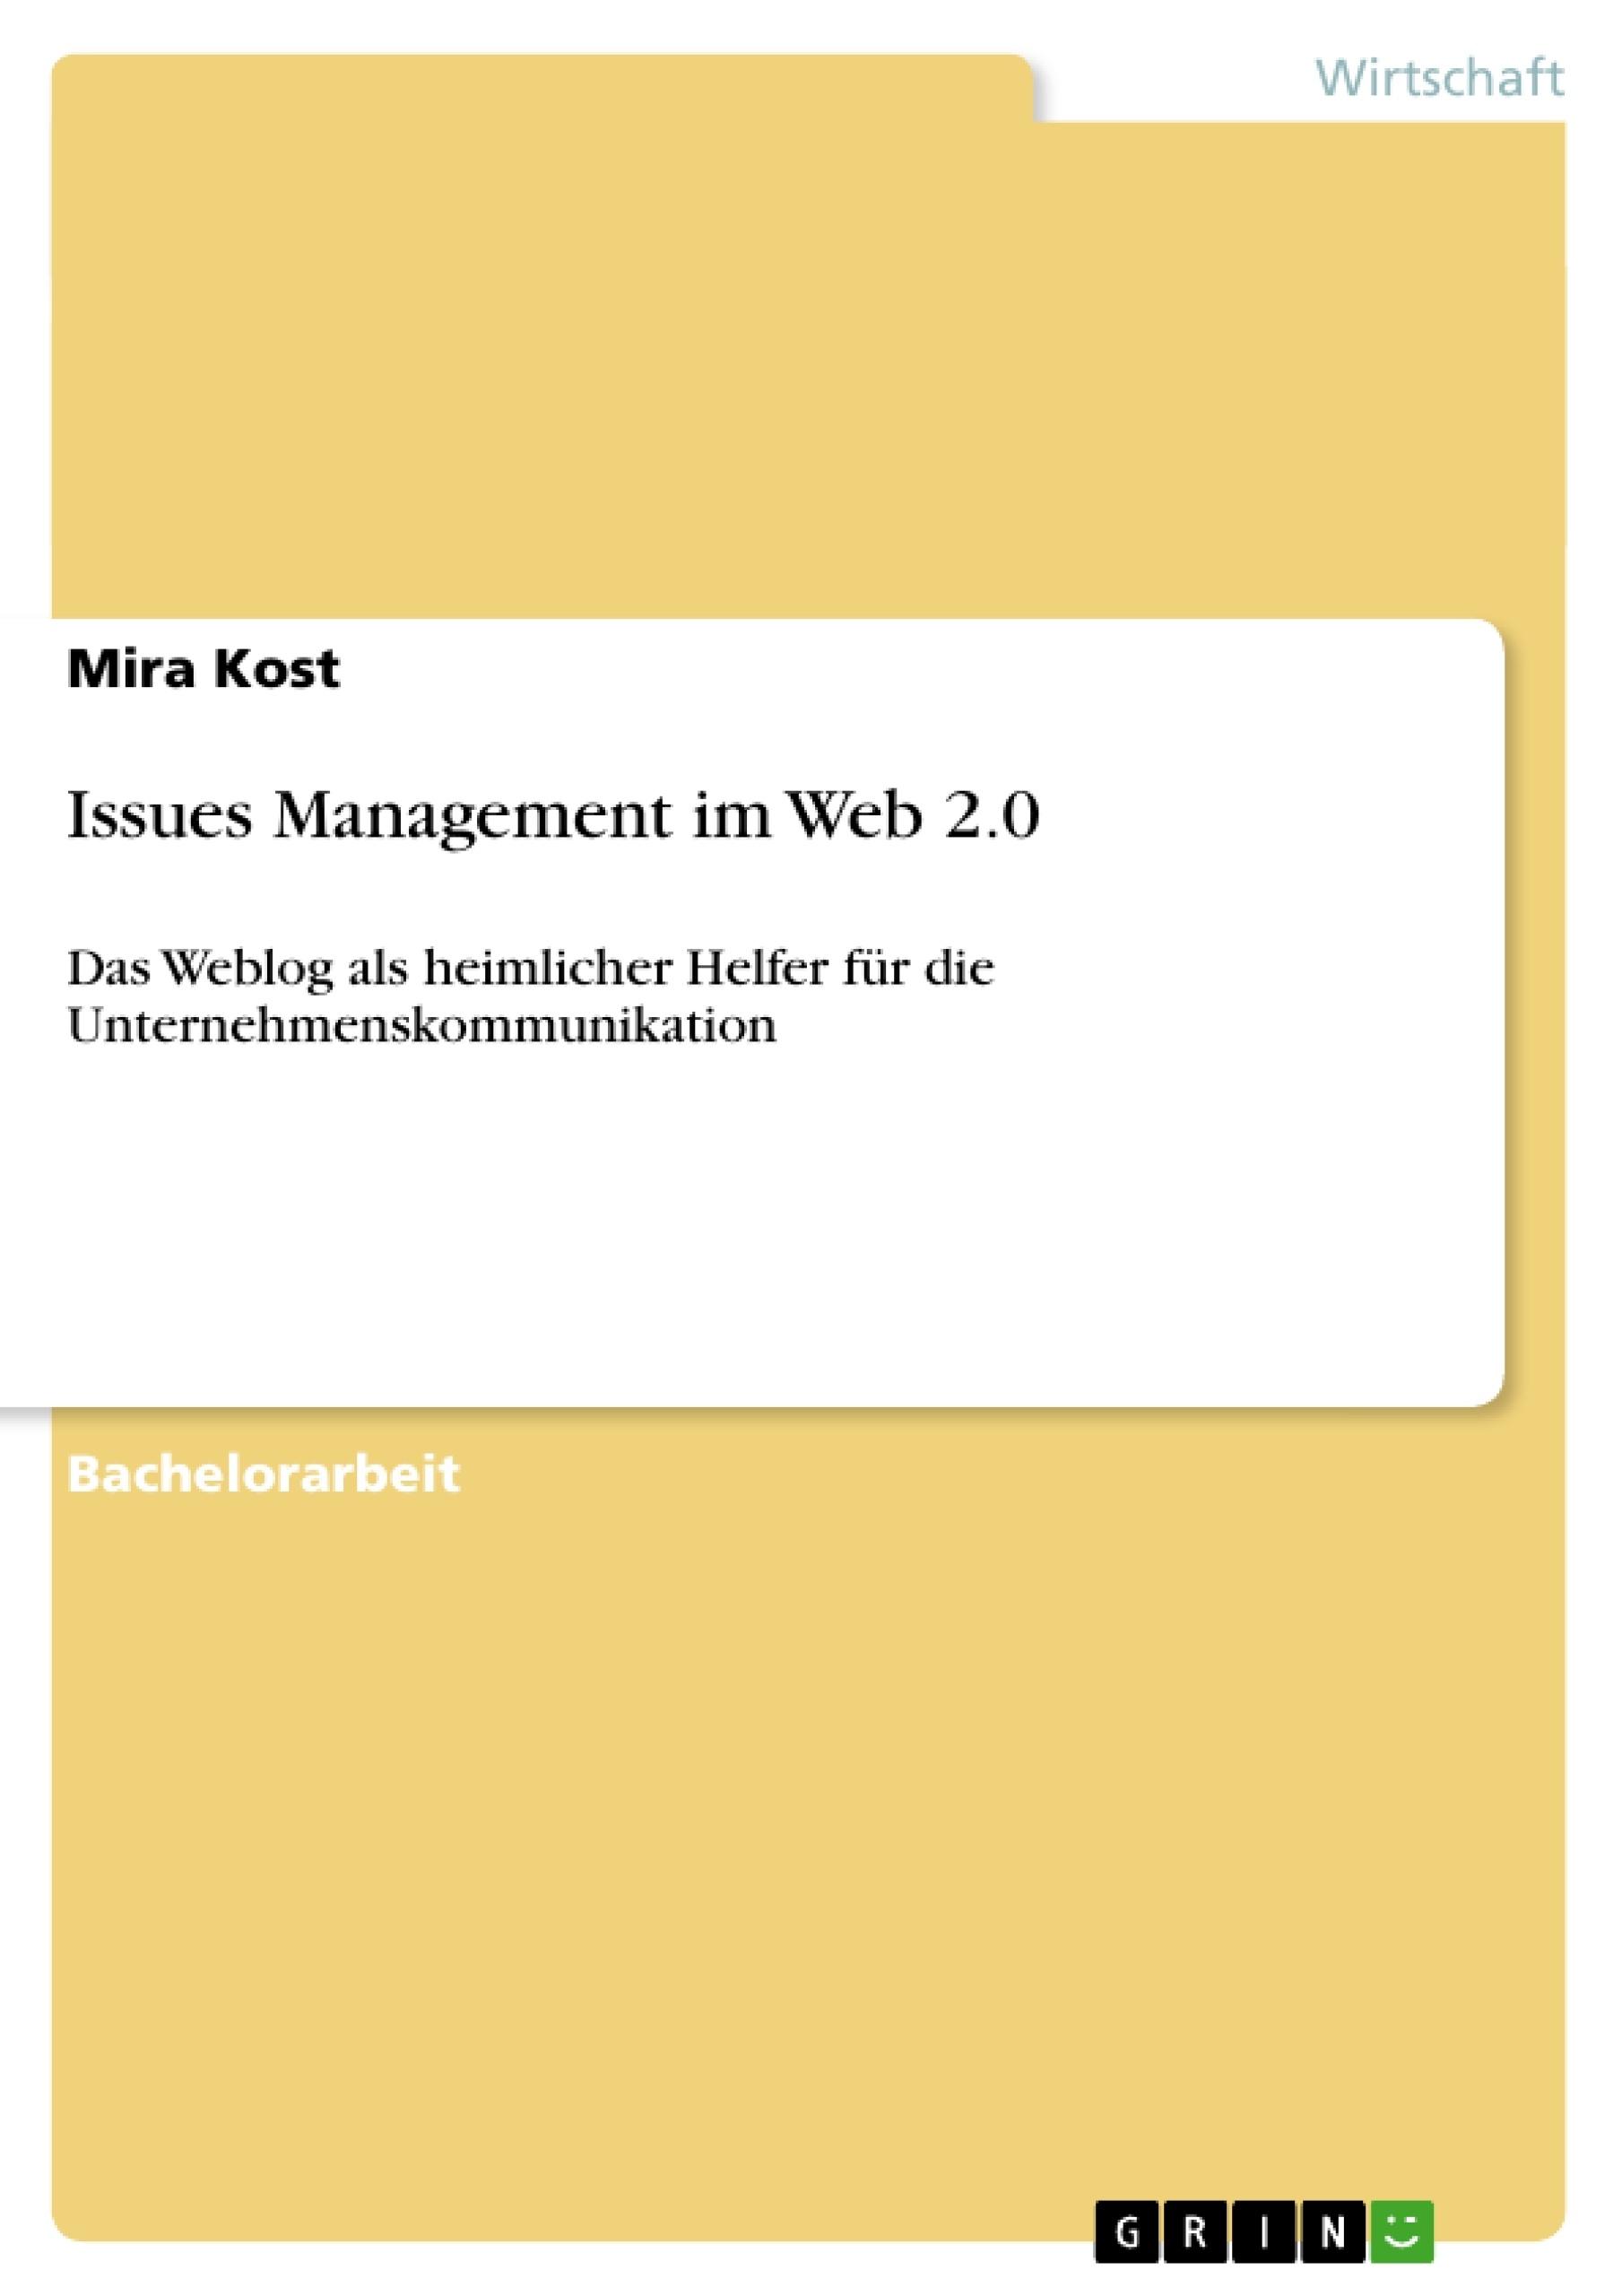 Titel: Issues Management im Web 2.0